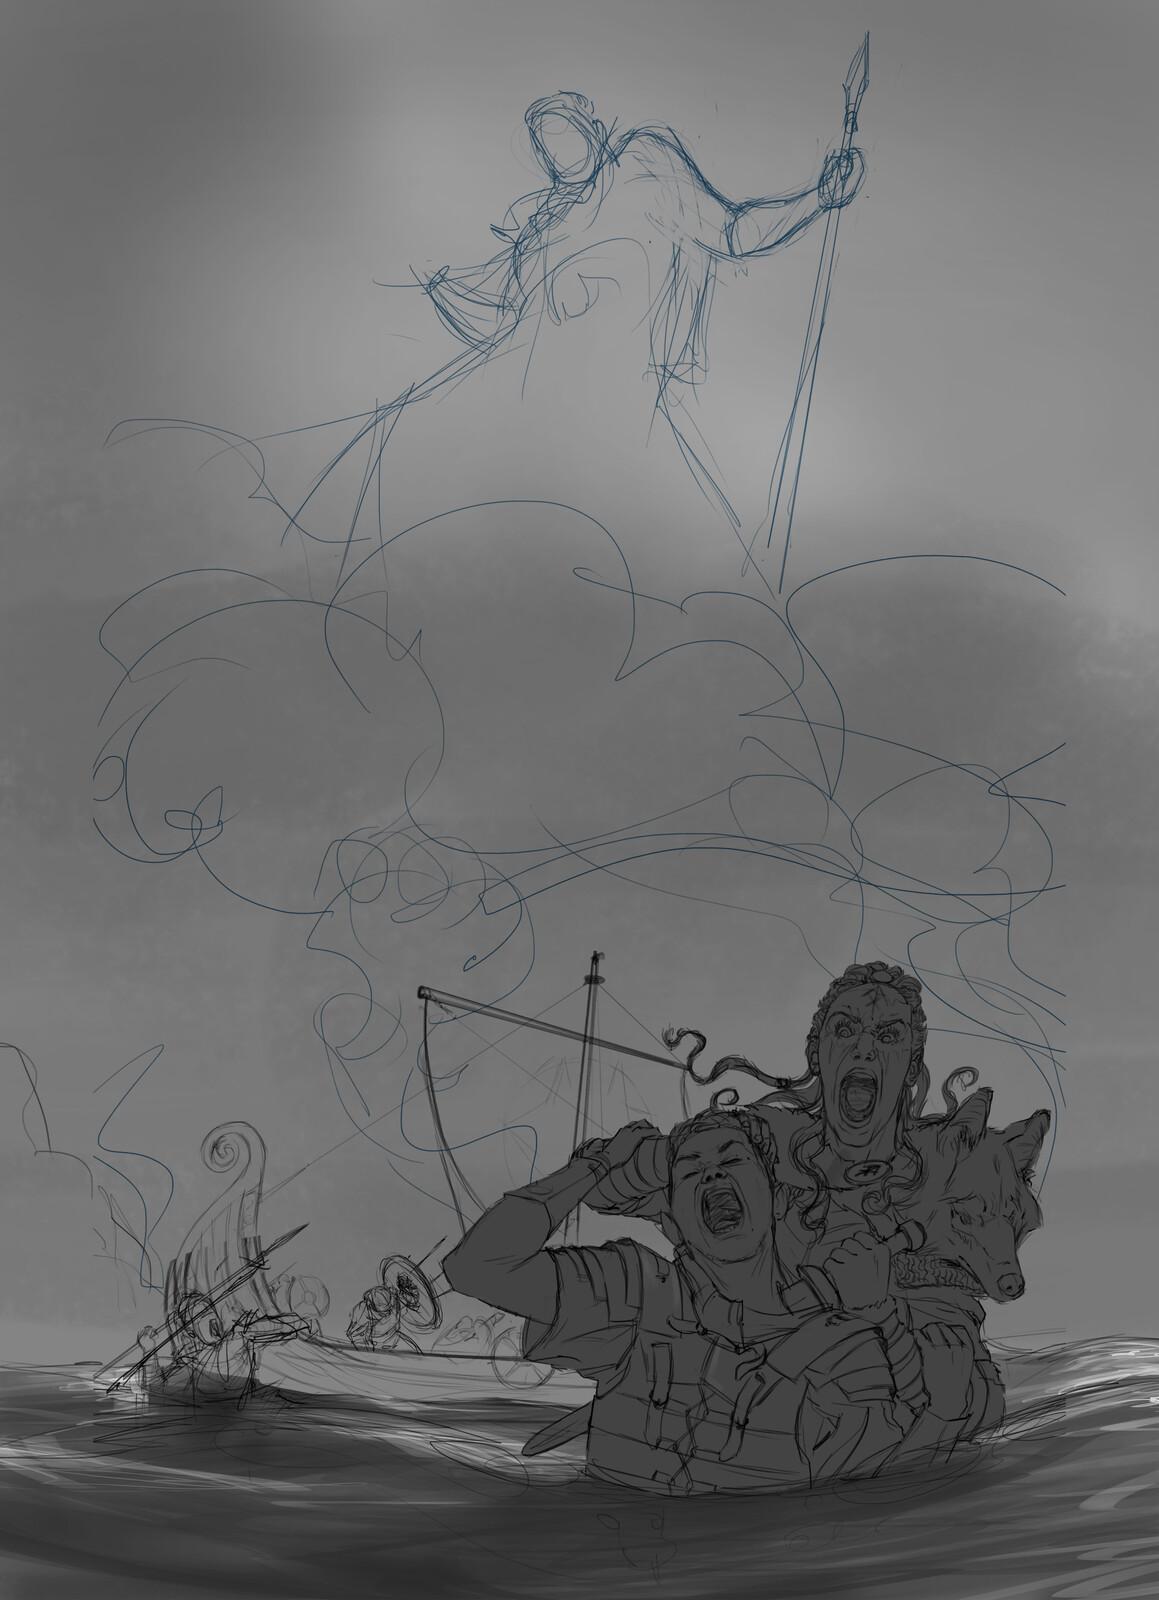 Inicial sketch